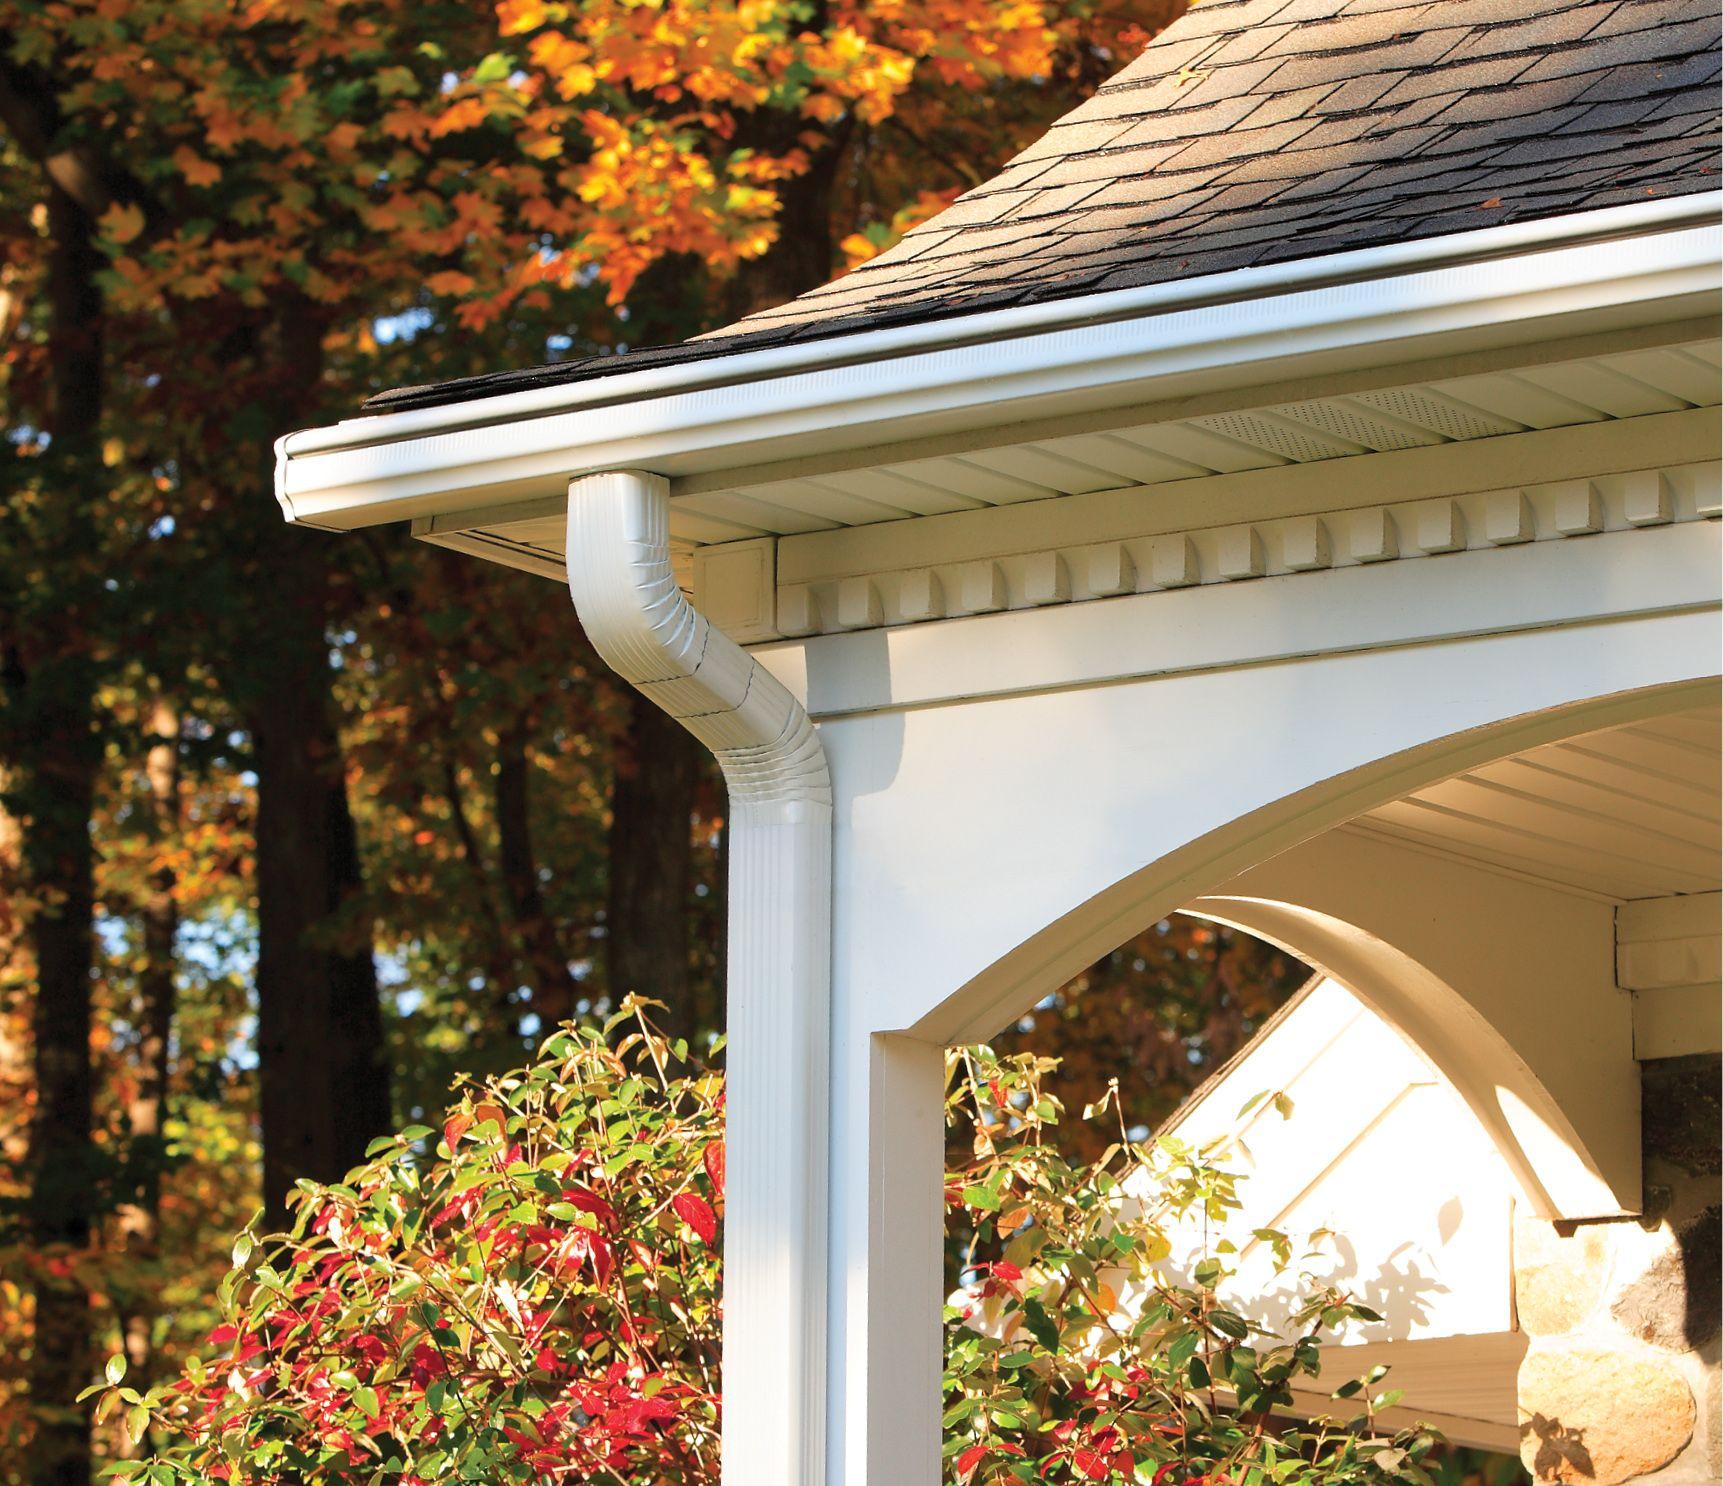 Leafguard Home Model Images Gutters Gutter Gutter Protection